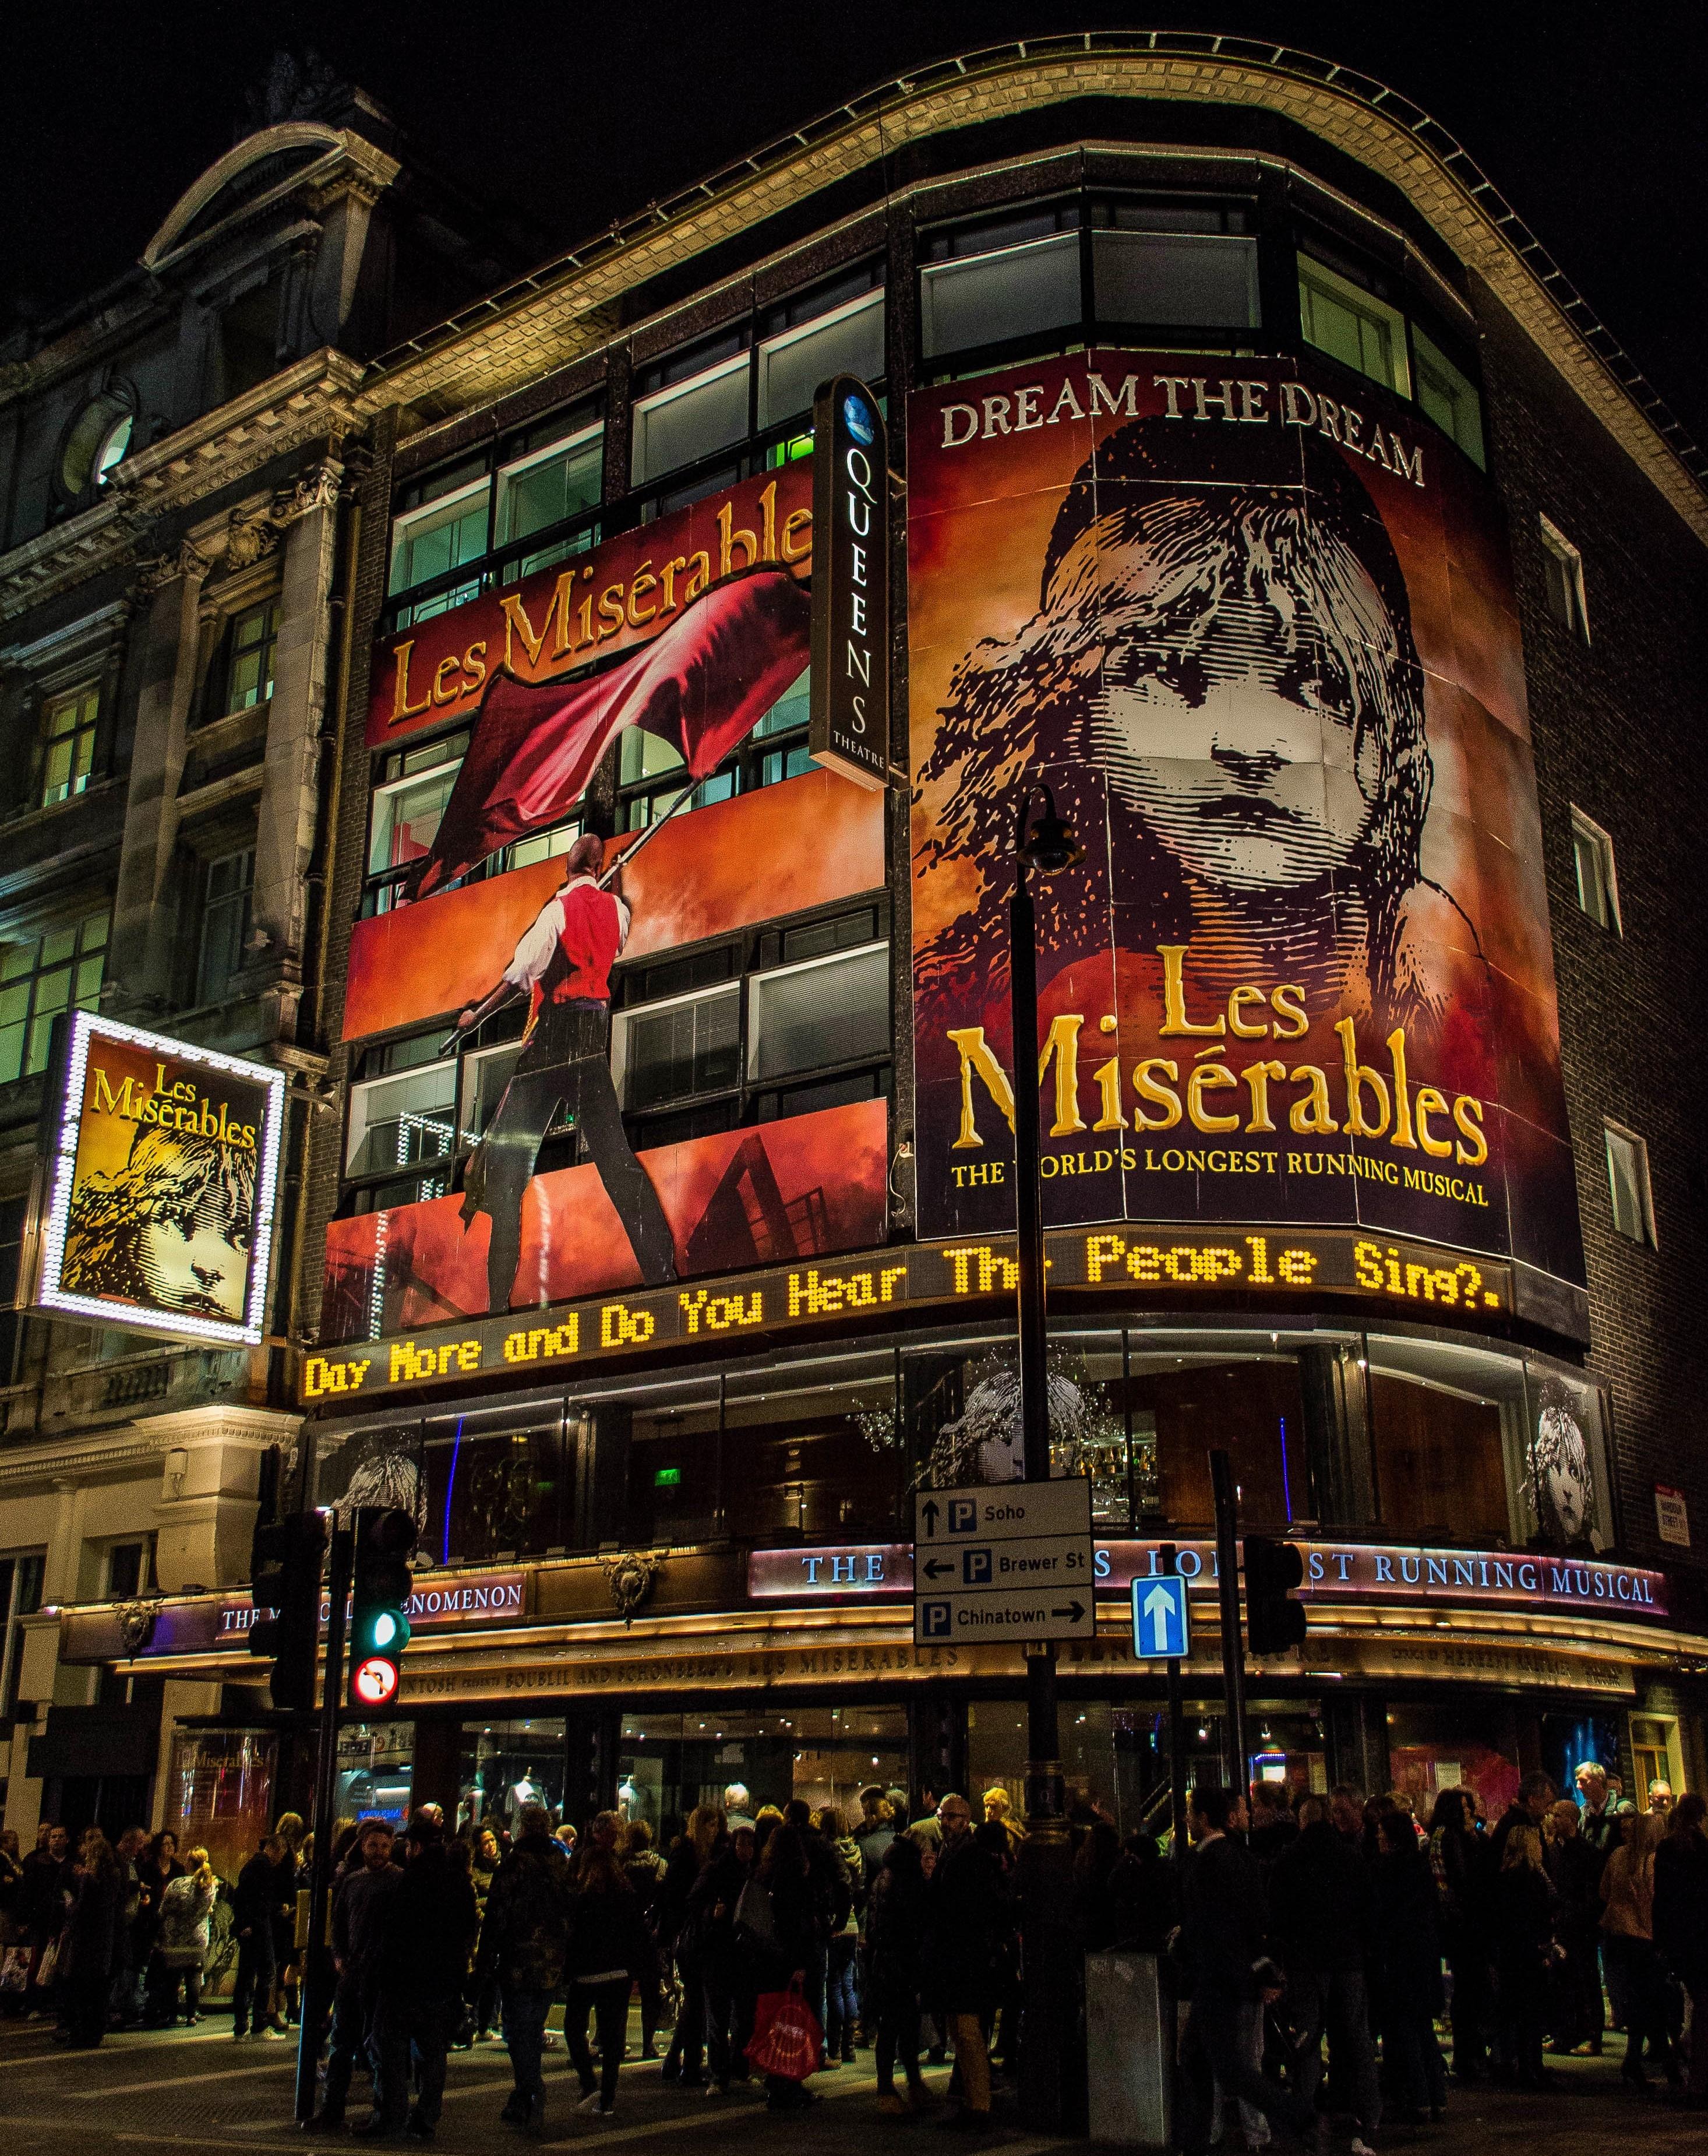 London's West End Sondheim Theatre